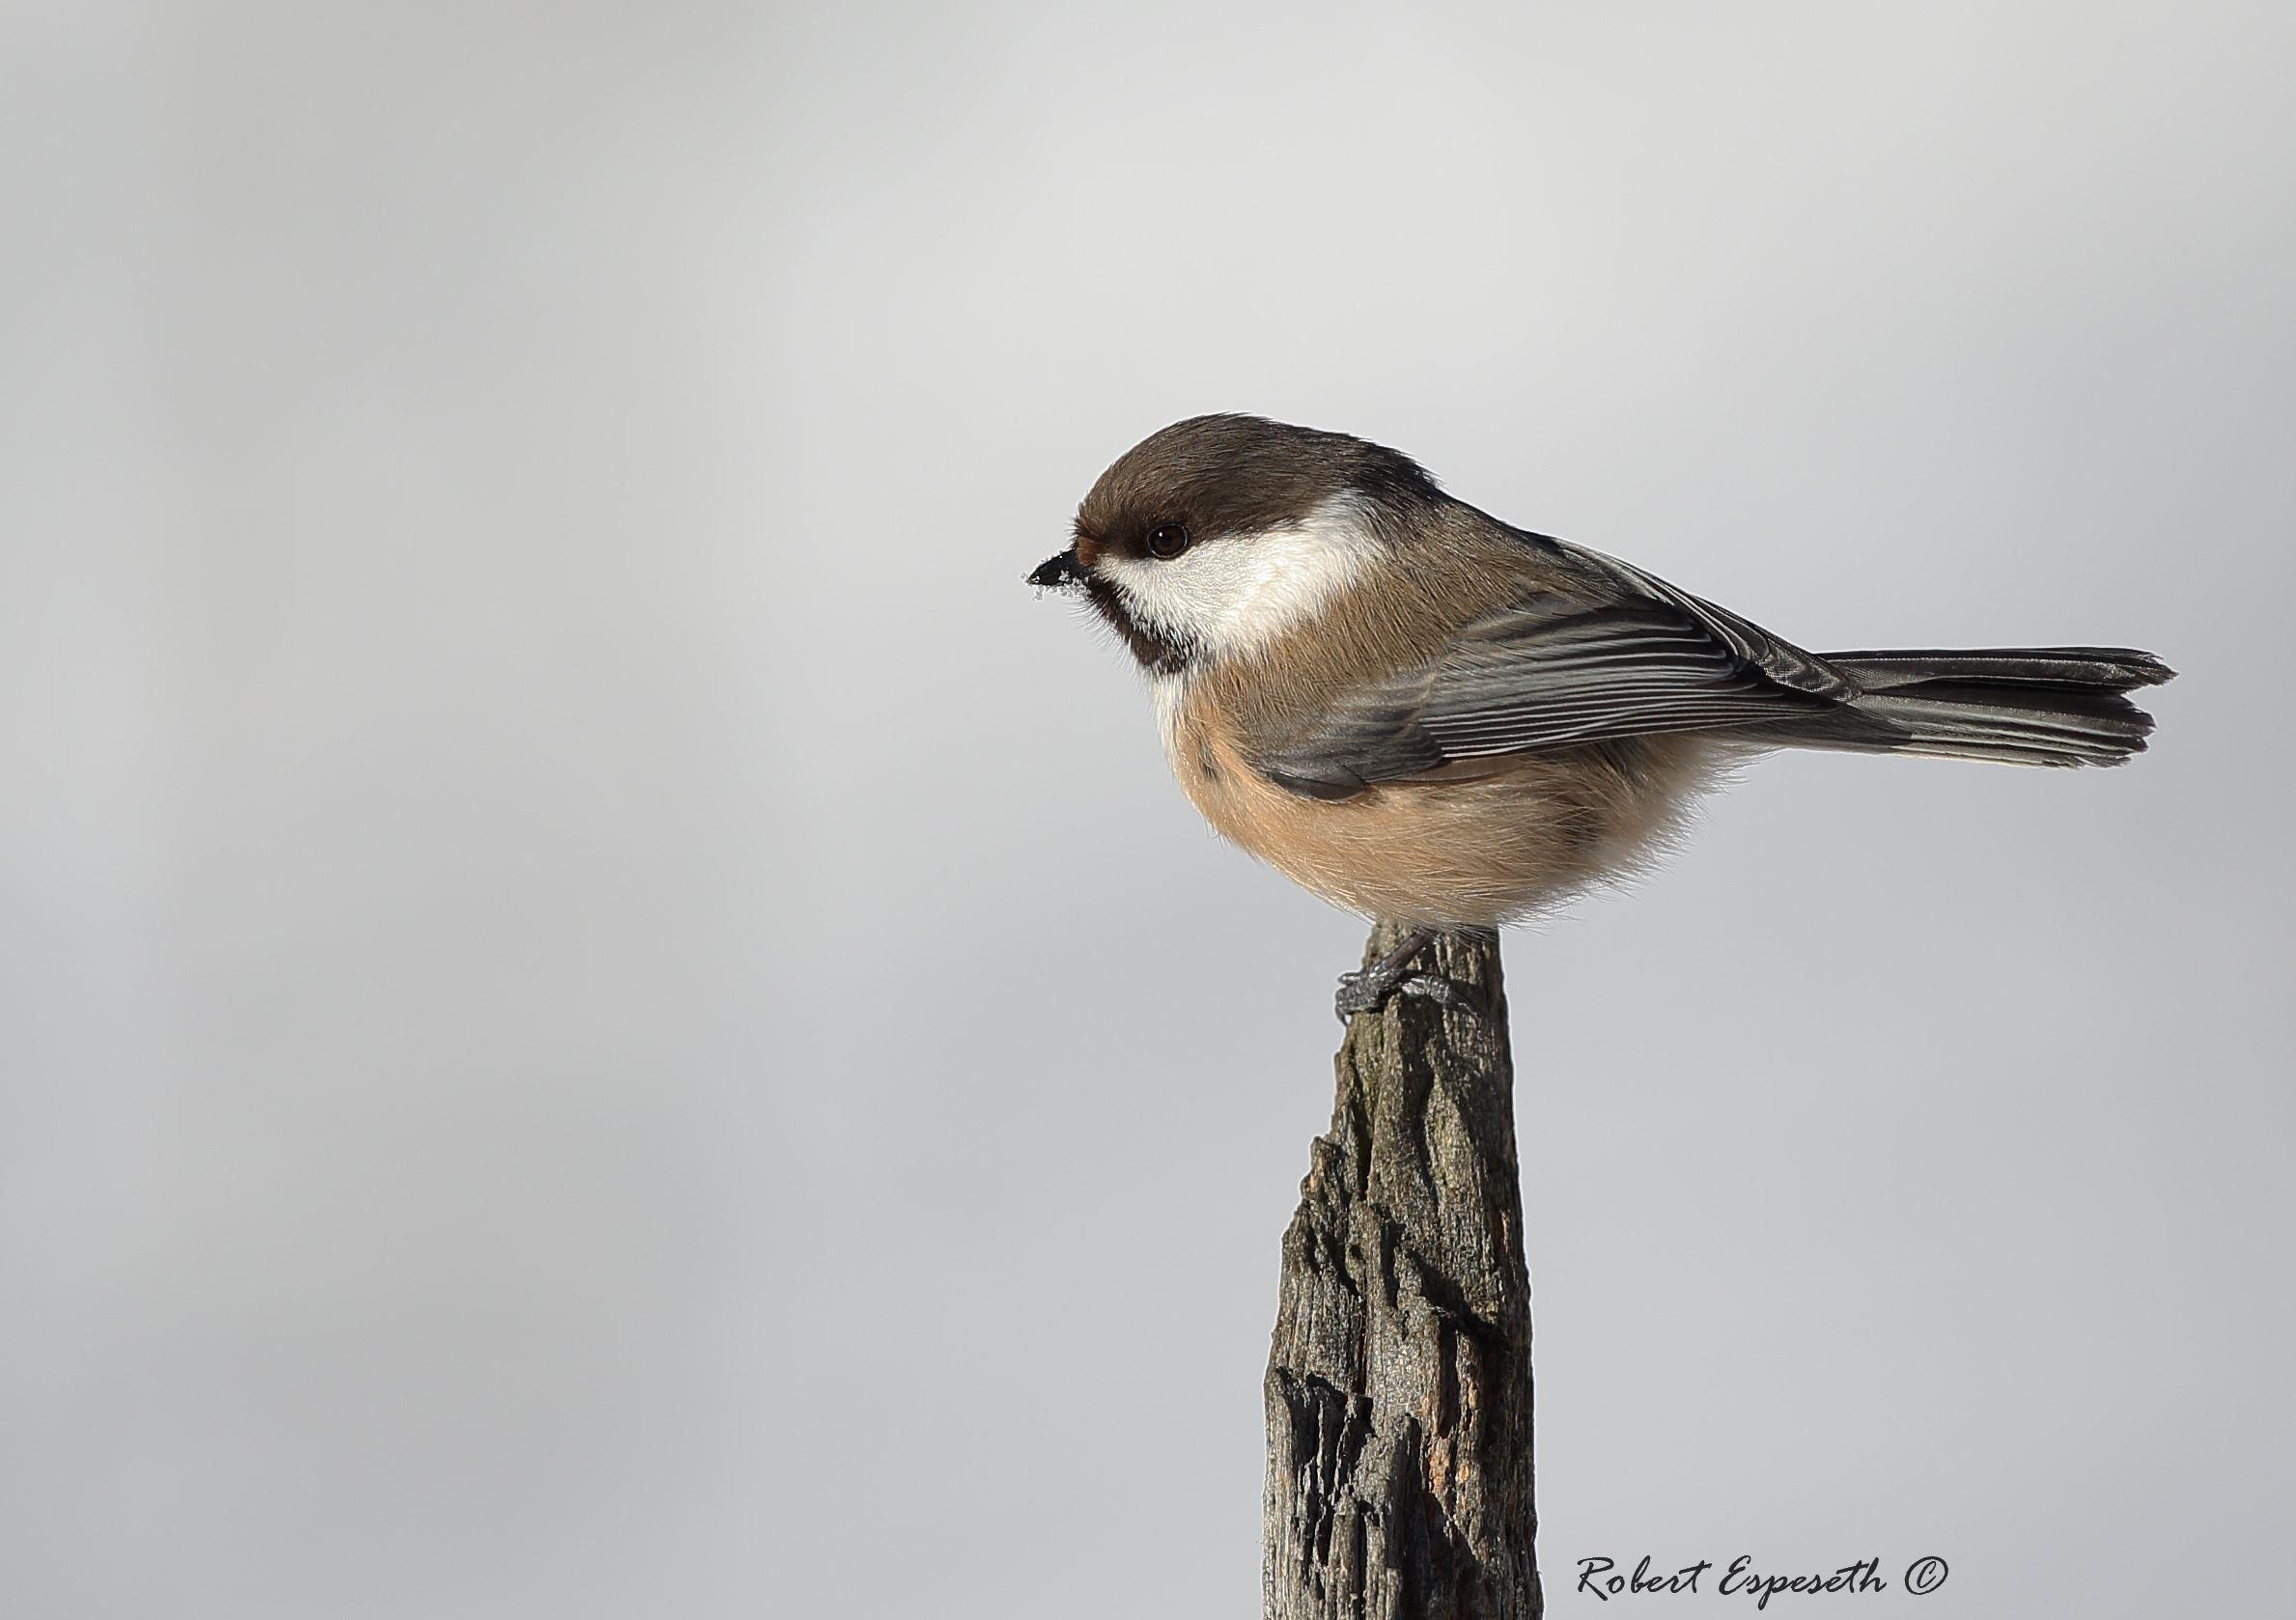 Photo tour for birdwatchers to Myrbekken